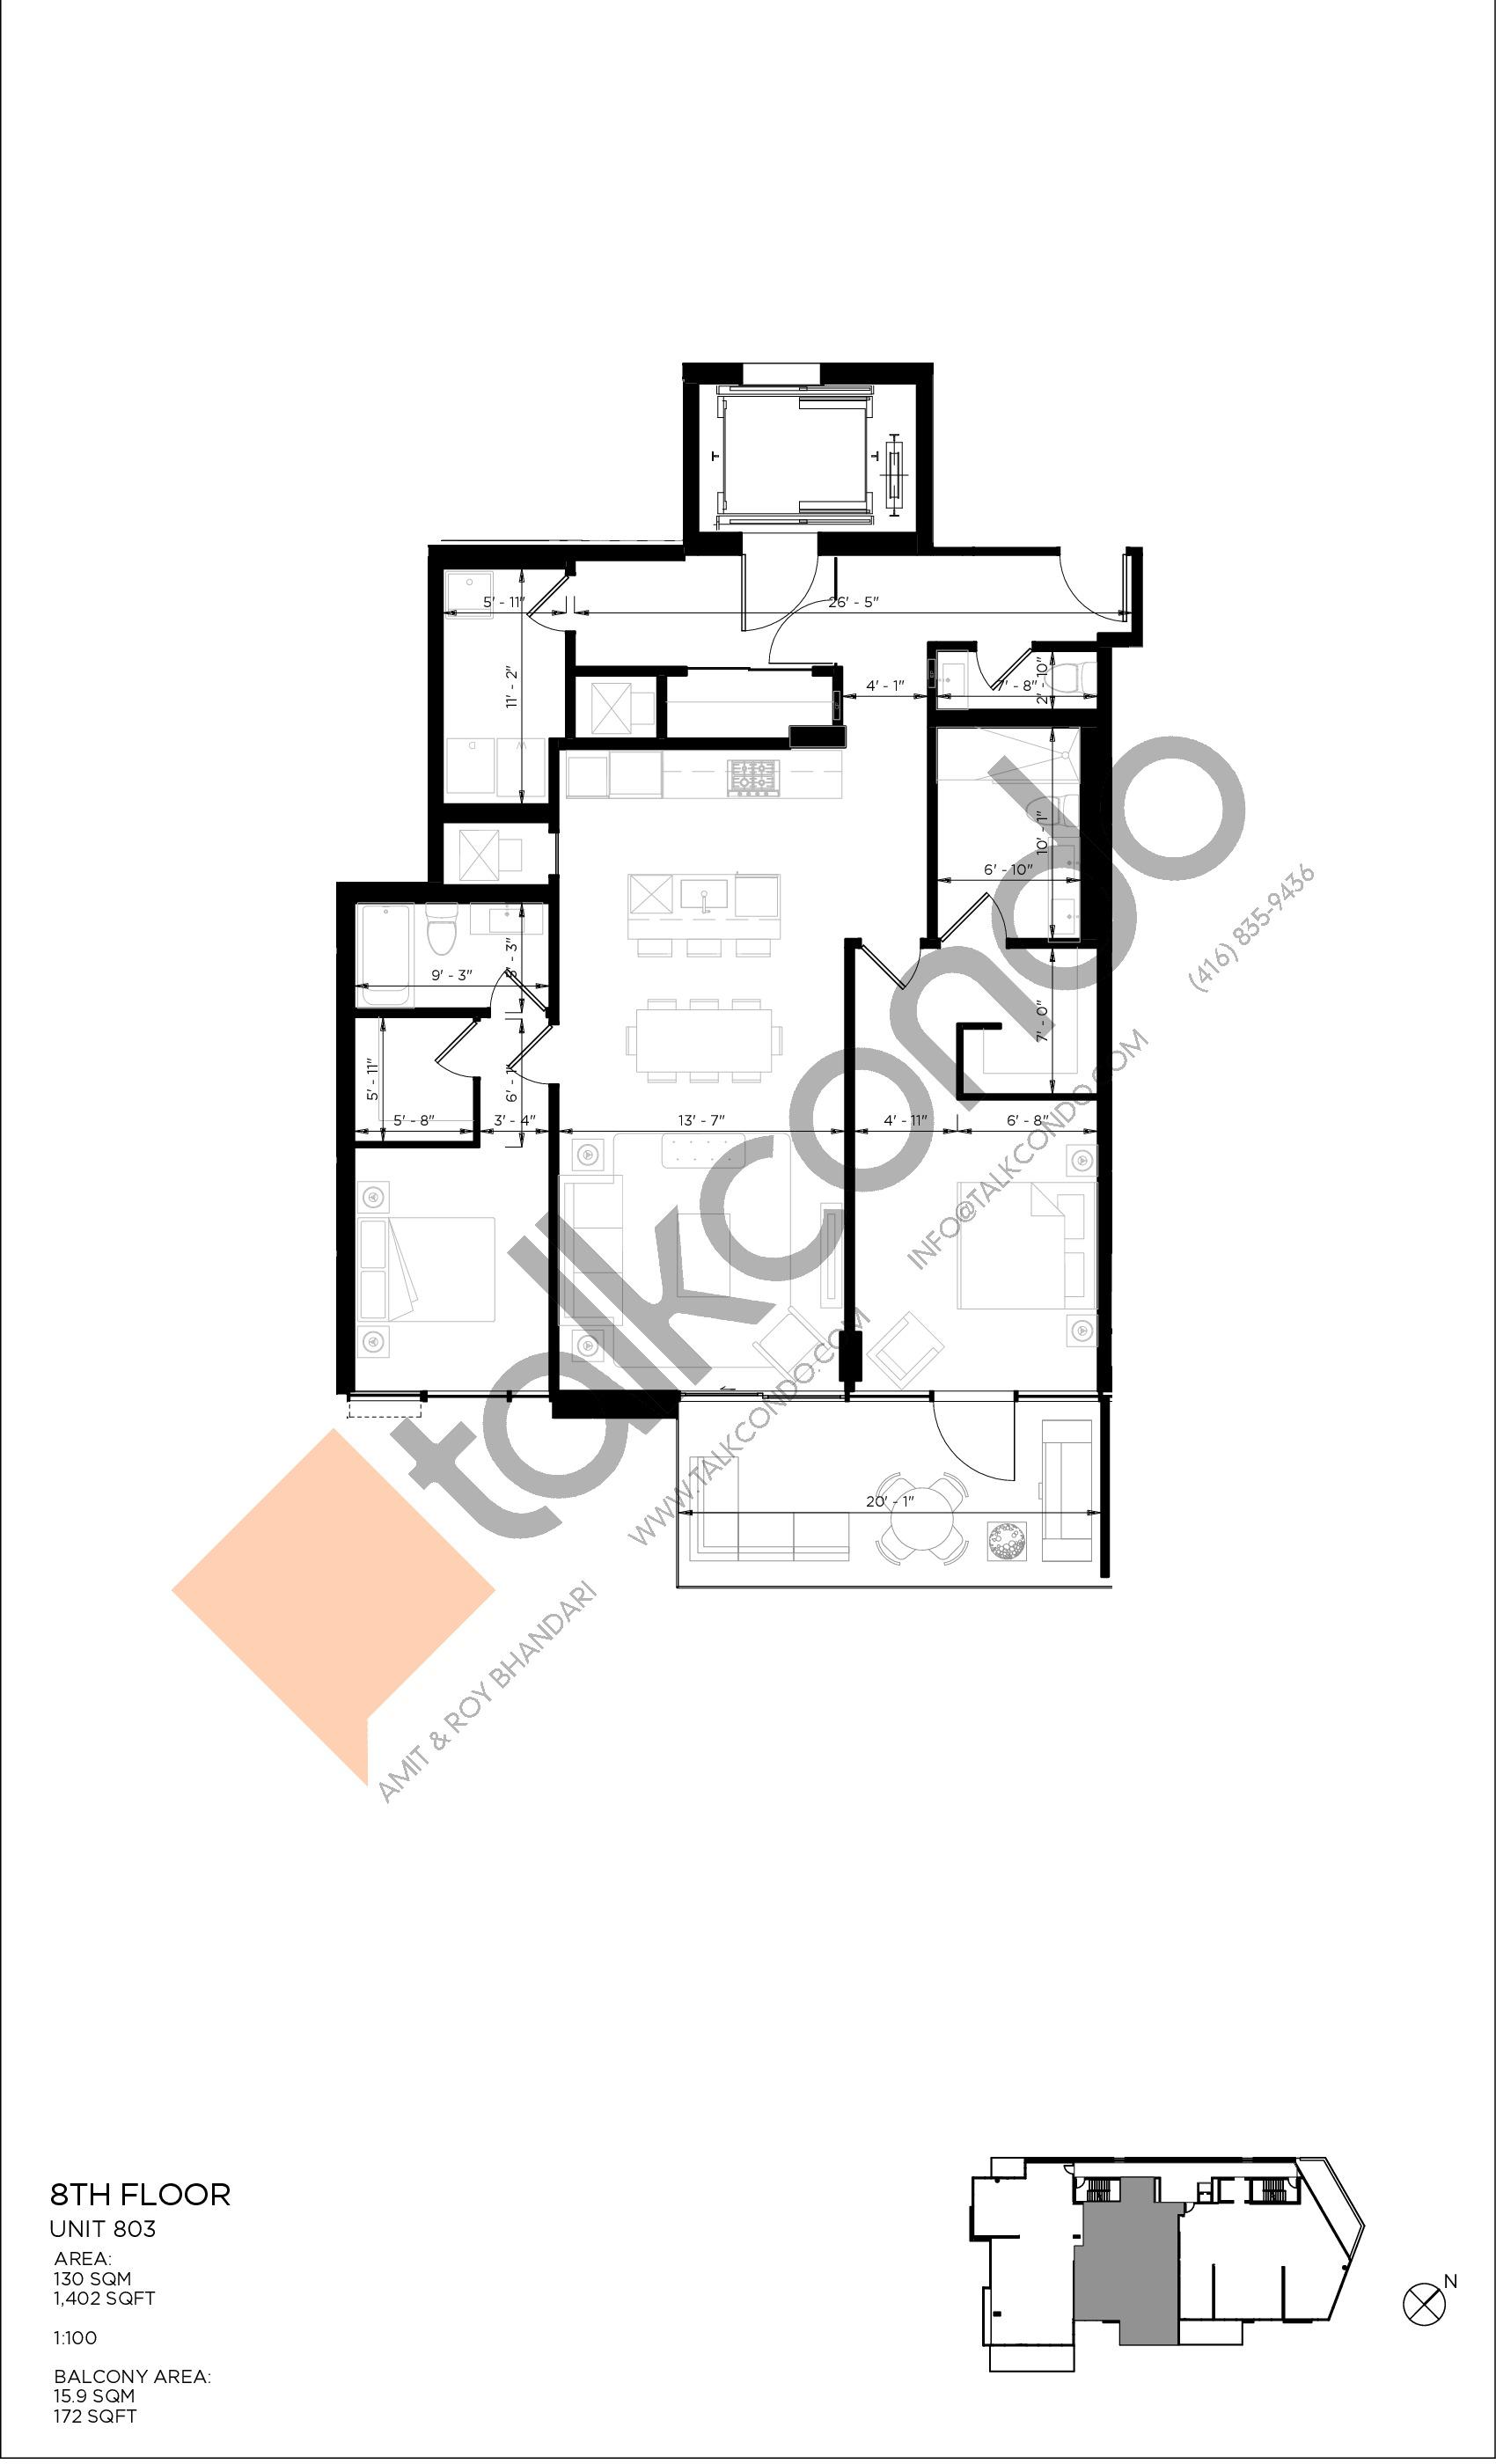 Unit 803 Floor Plan at 346 Davenport Condos - 1402 sq.ft